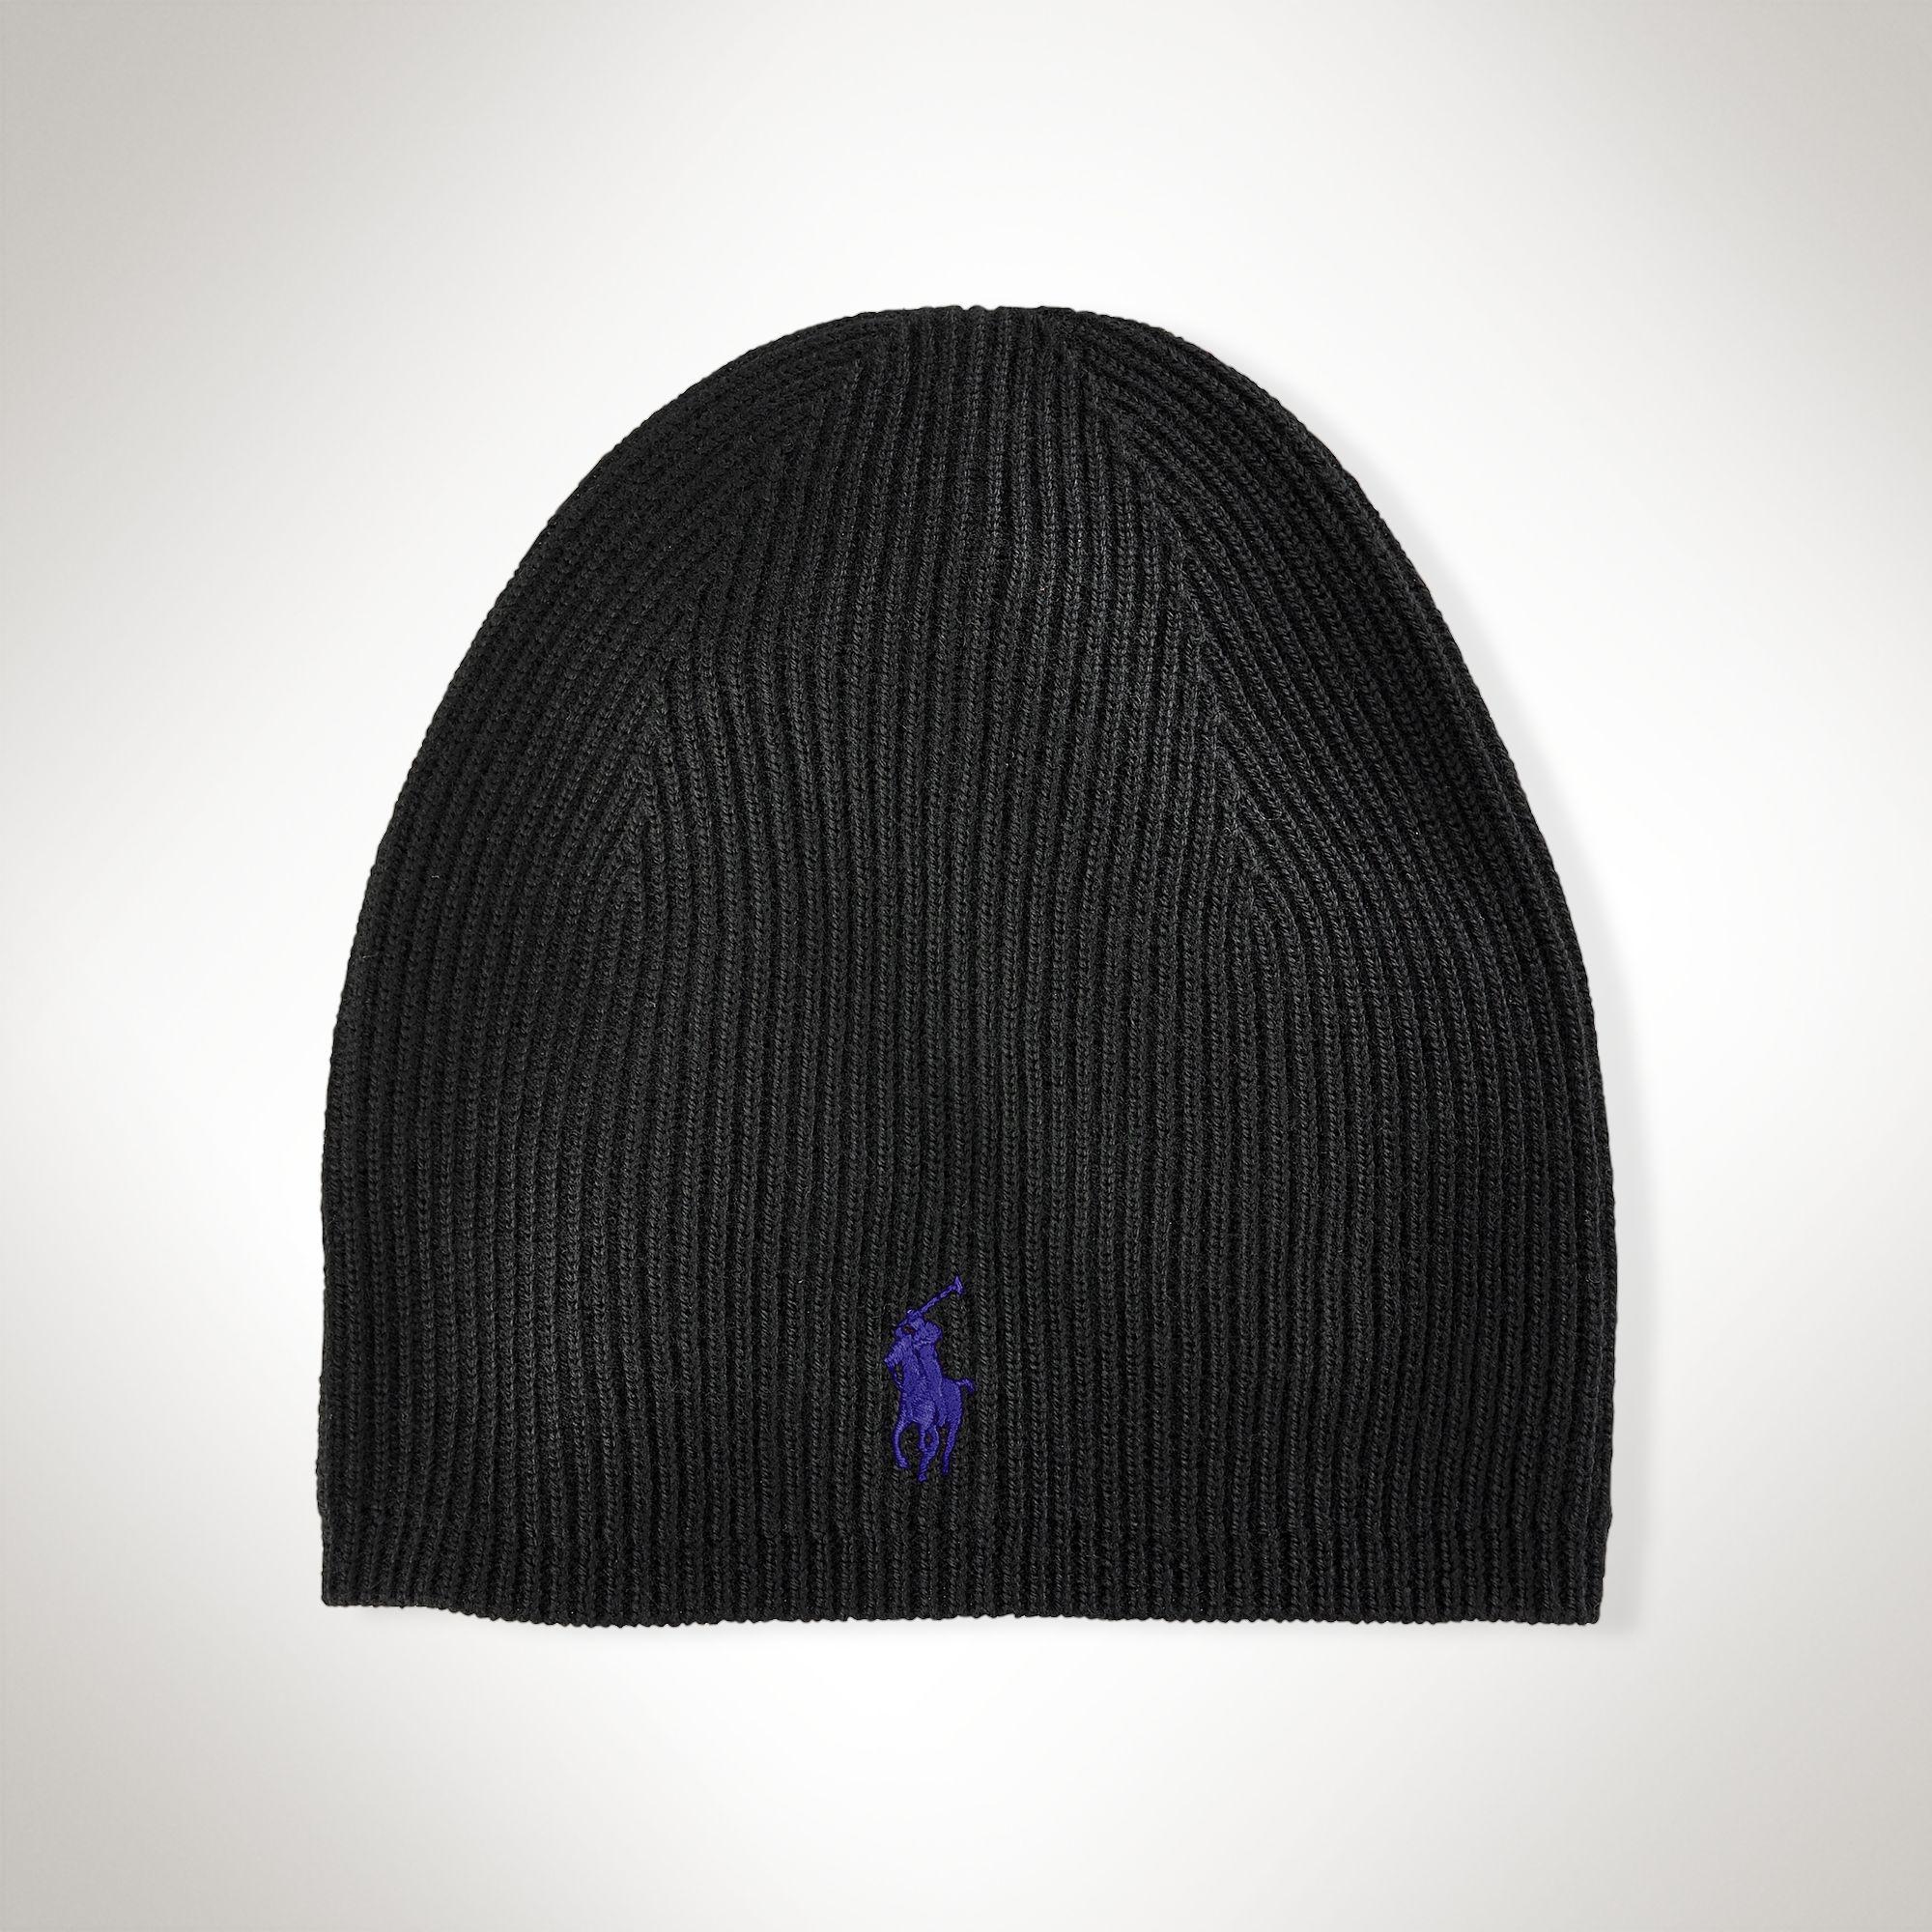 a8863abca Polo Ralph Lauren Merino Wool Skull Cap in Black for Men - Lyst